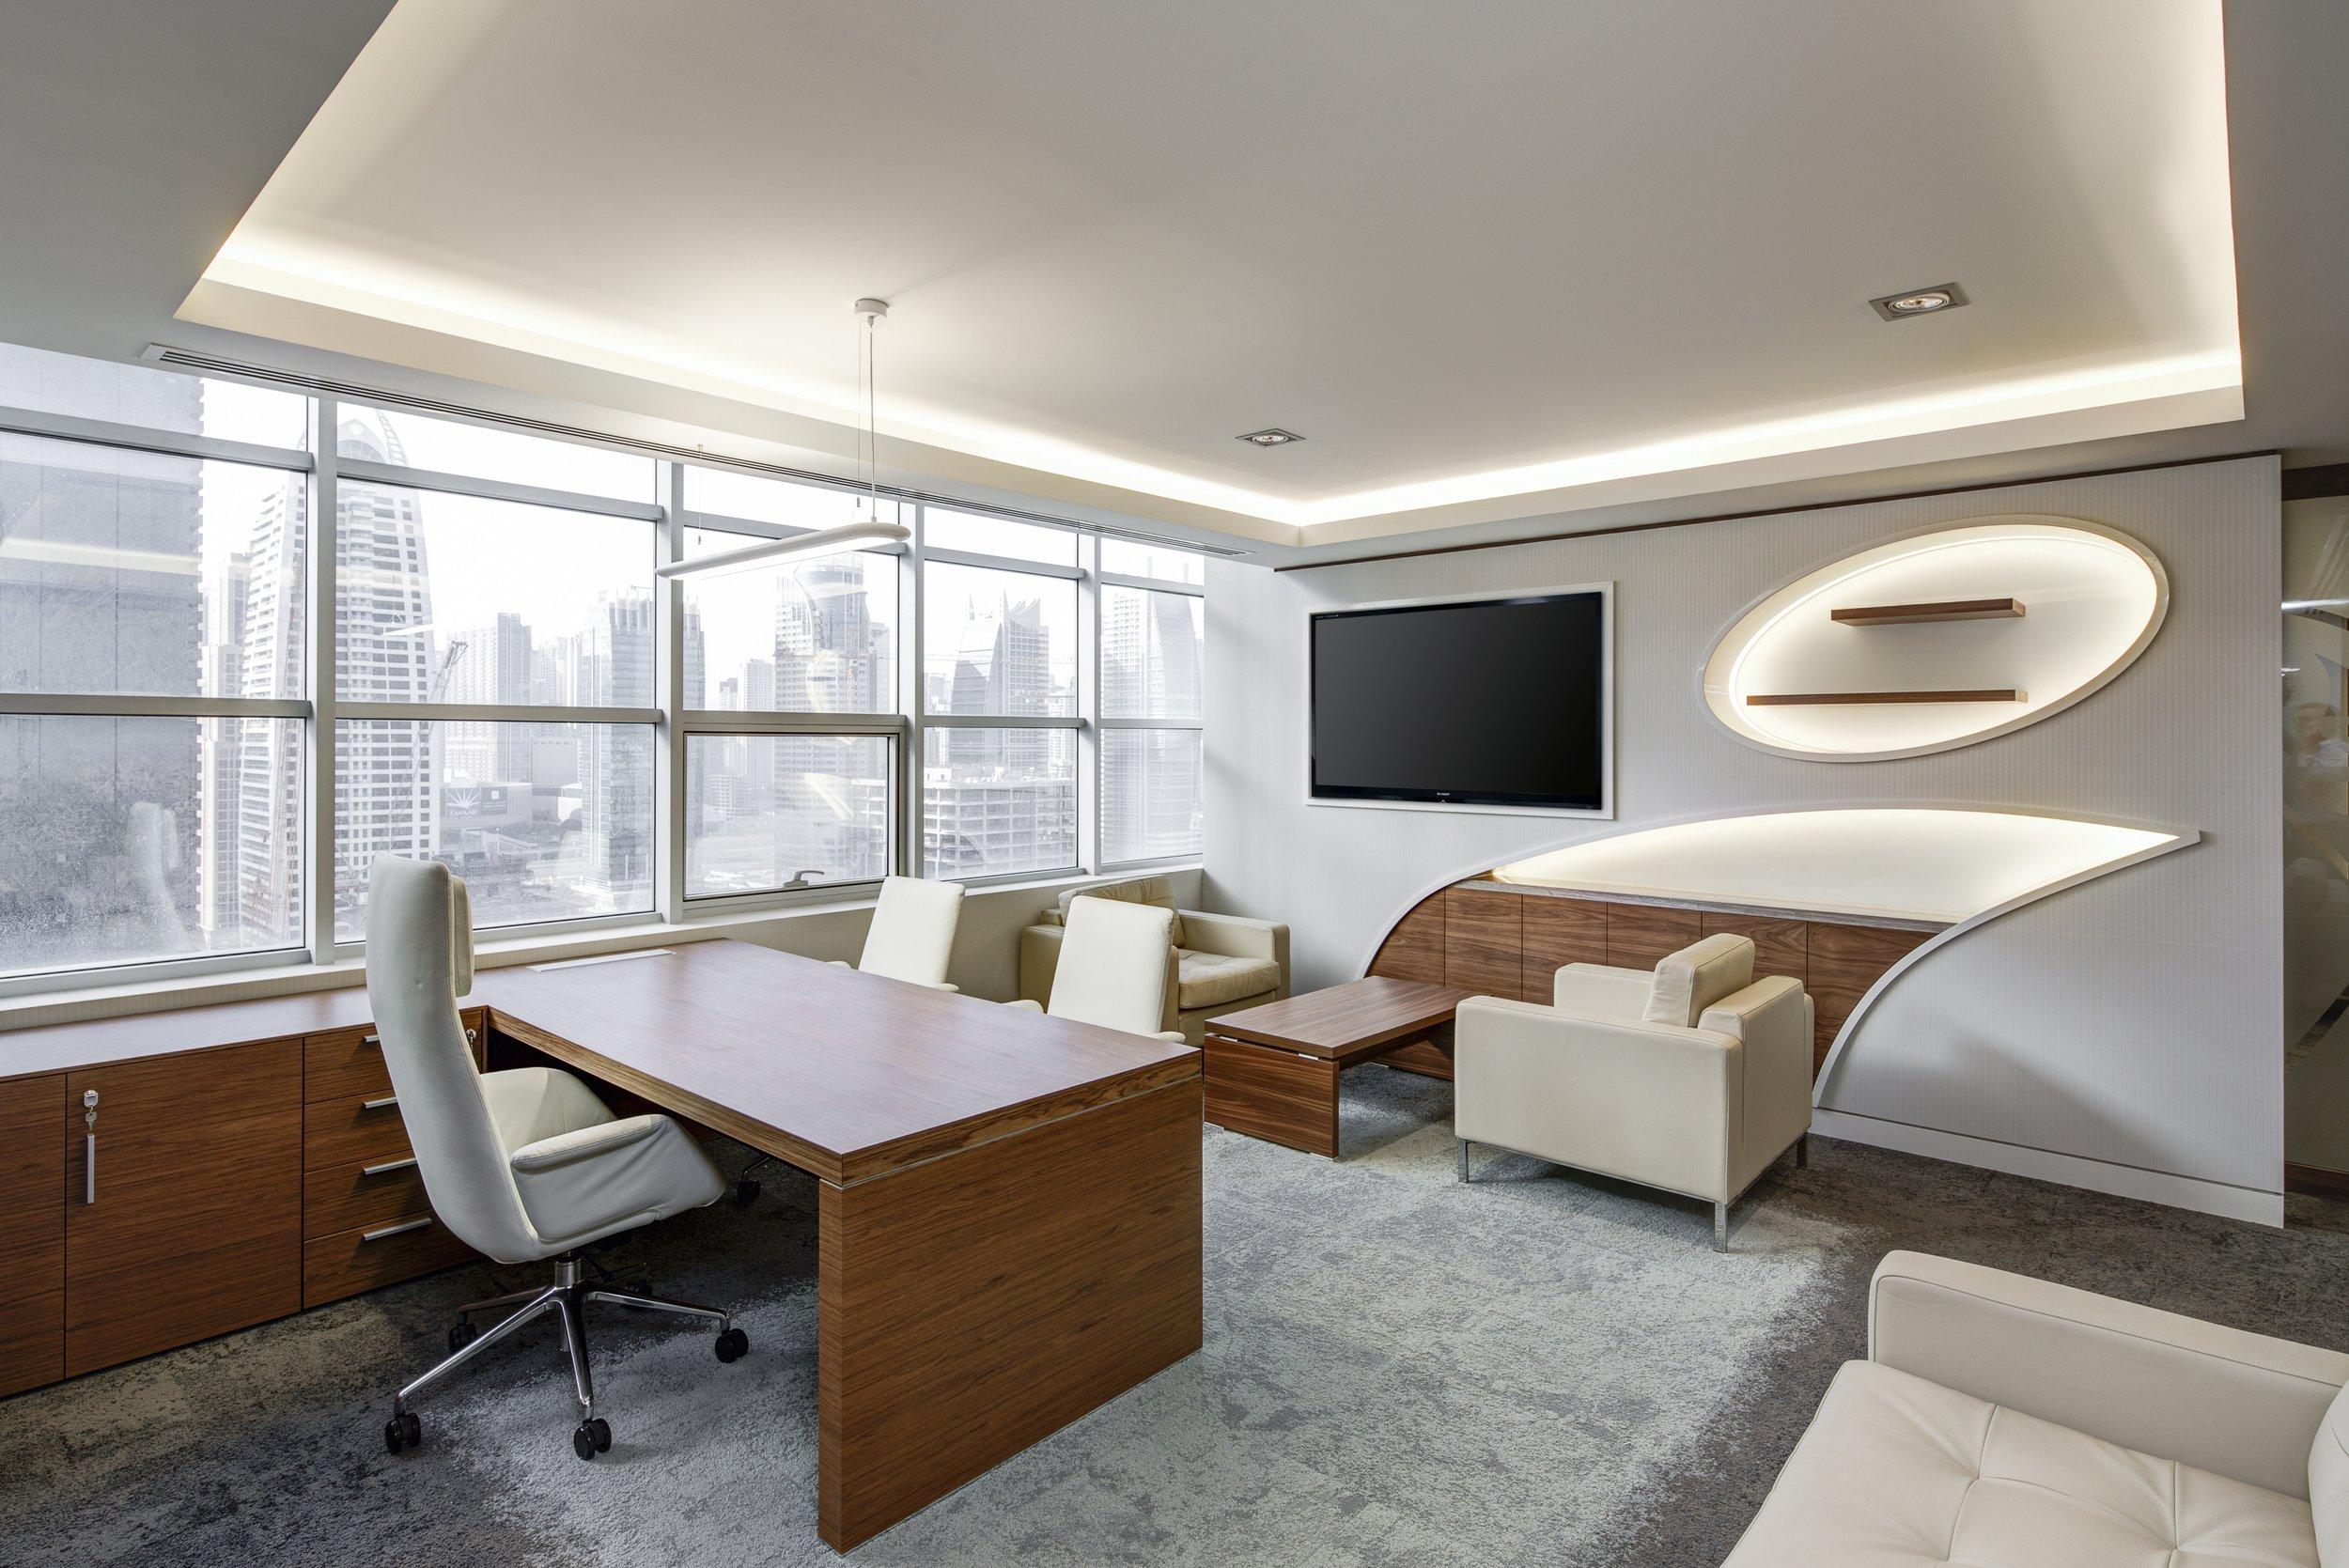 desk-furniture-interior-design-37347.jpg